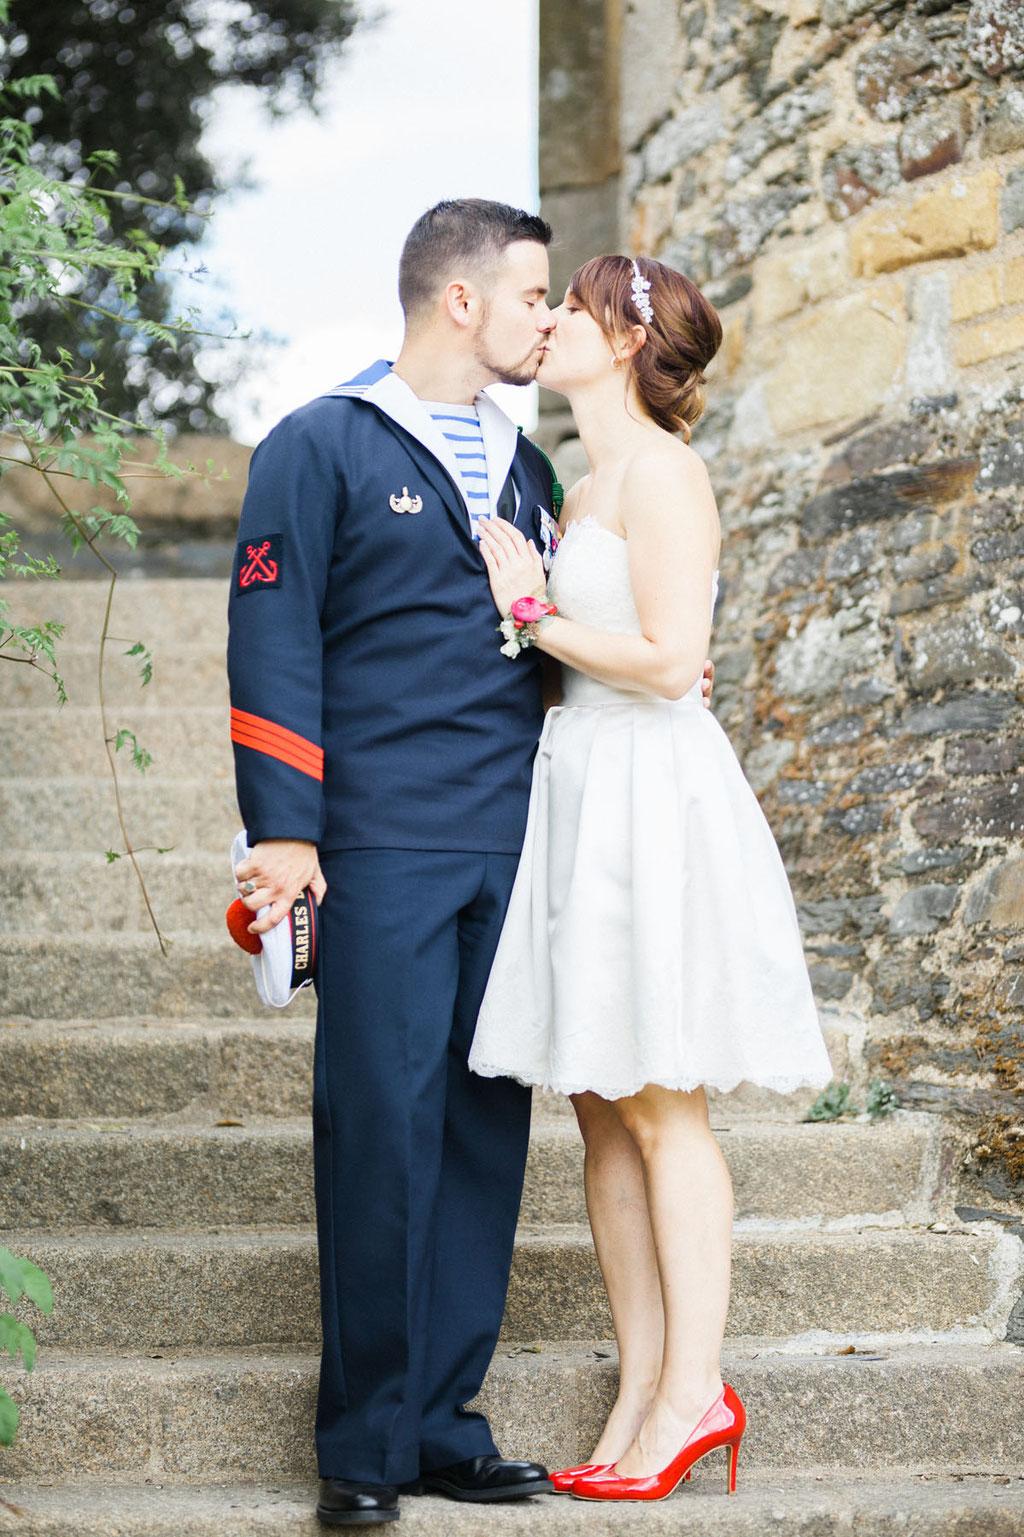 Manoir de la fresynaye mariage Bretagne Orlane Boisard séance couple